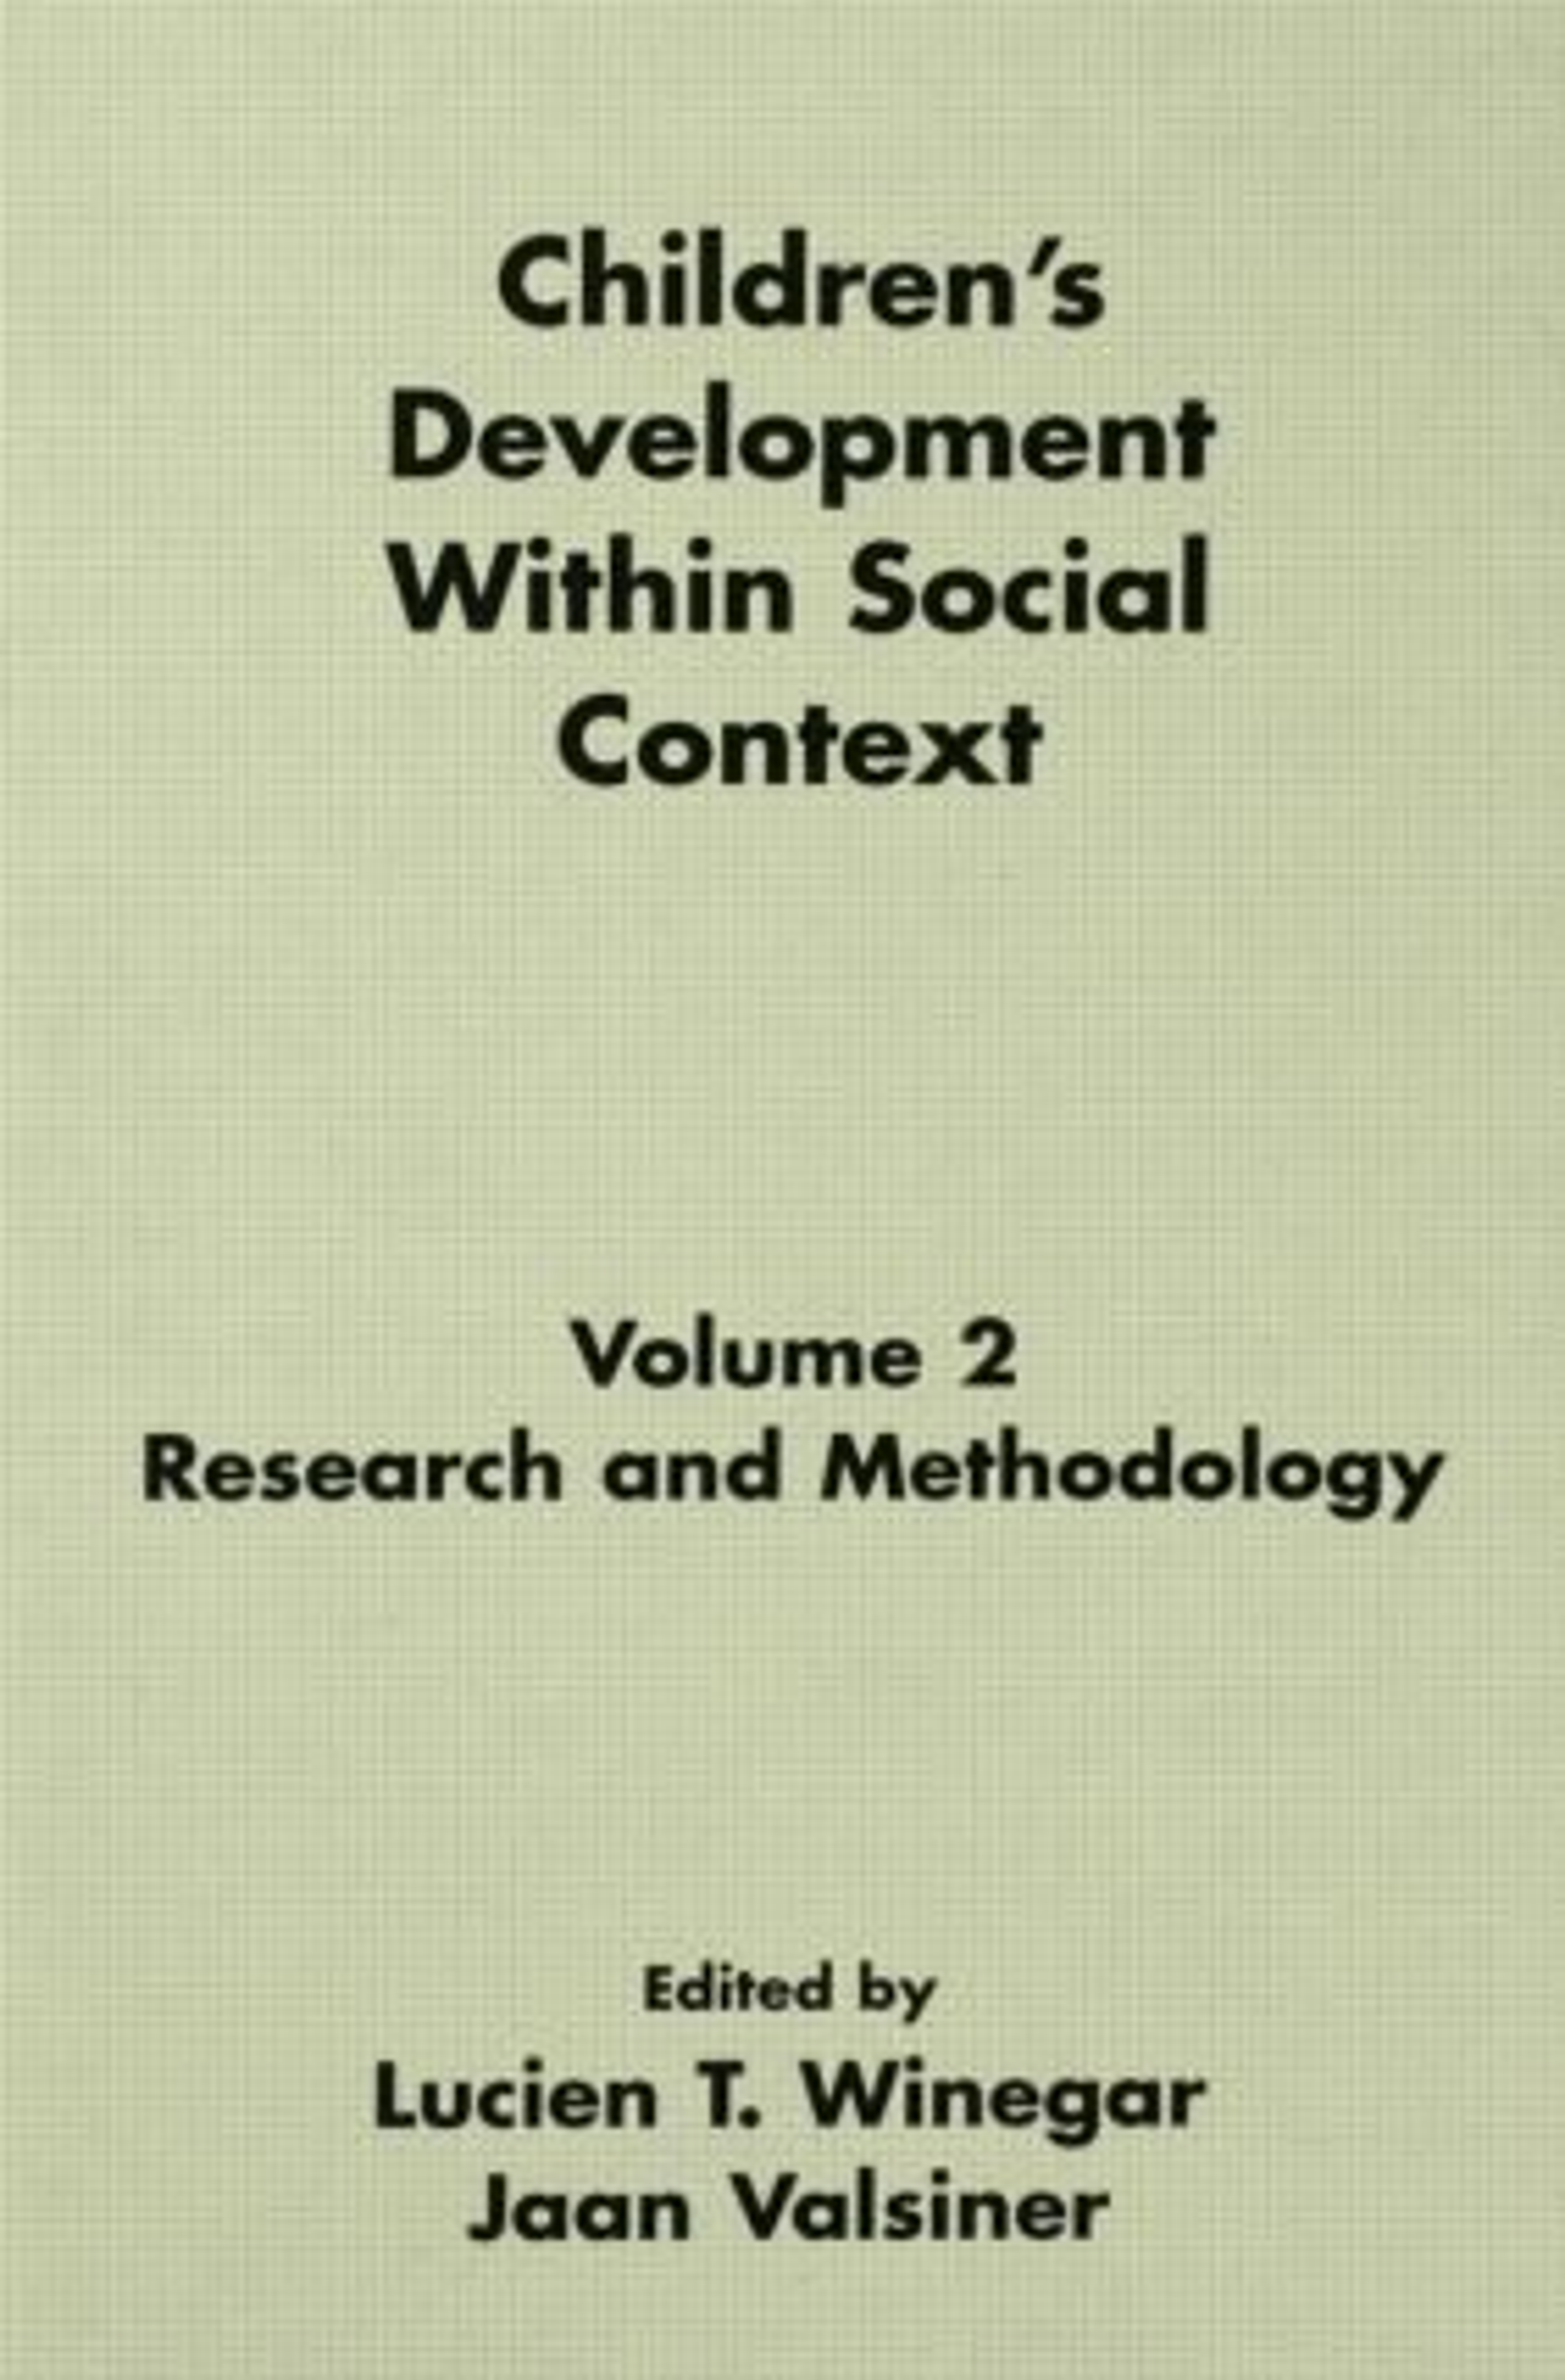 Children's Development Within Social Context